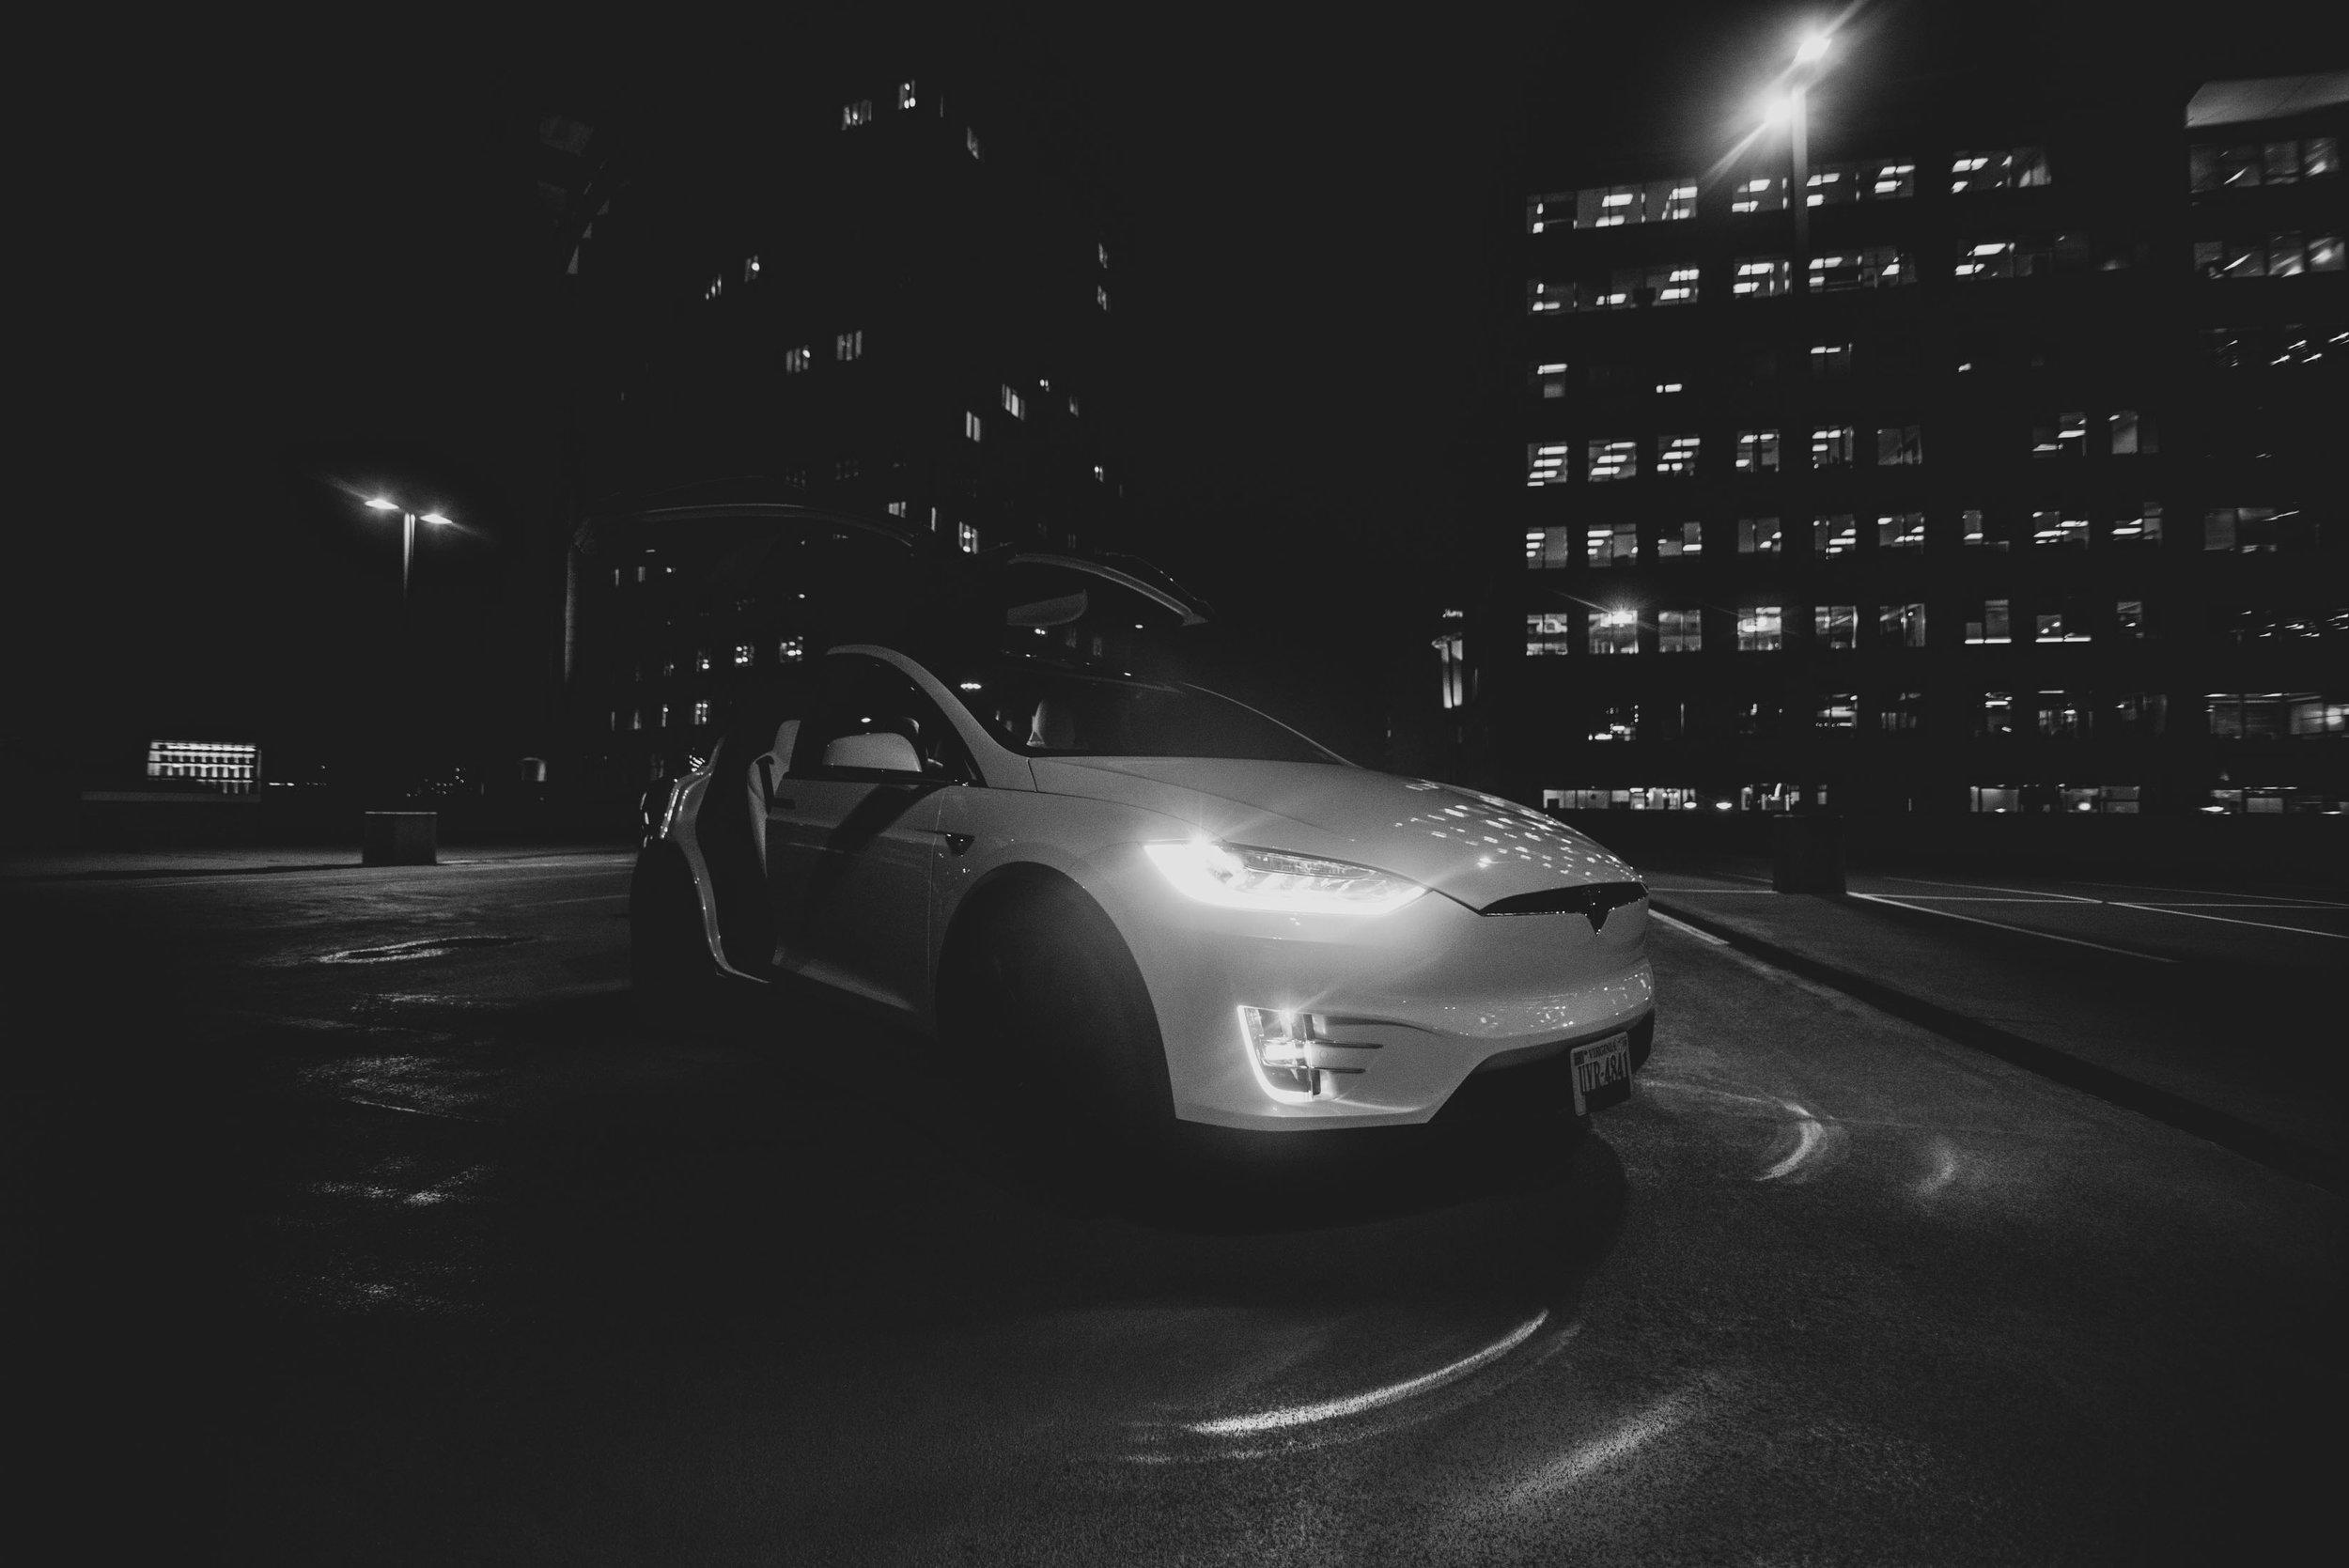 fleet+vehicle+sexy+car+photo+video+speed+tesla+p100d+vadym+guliuk+photography-2.jpg